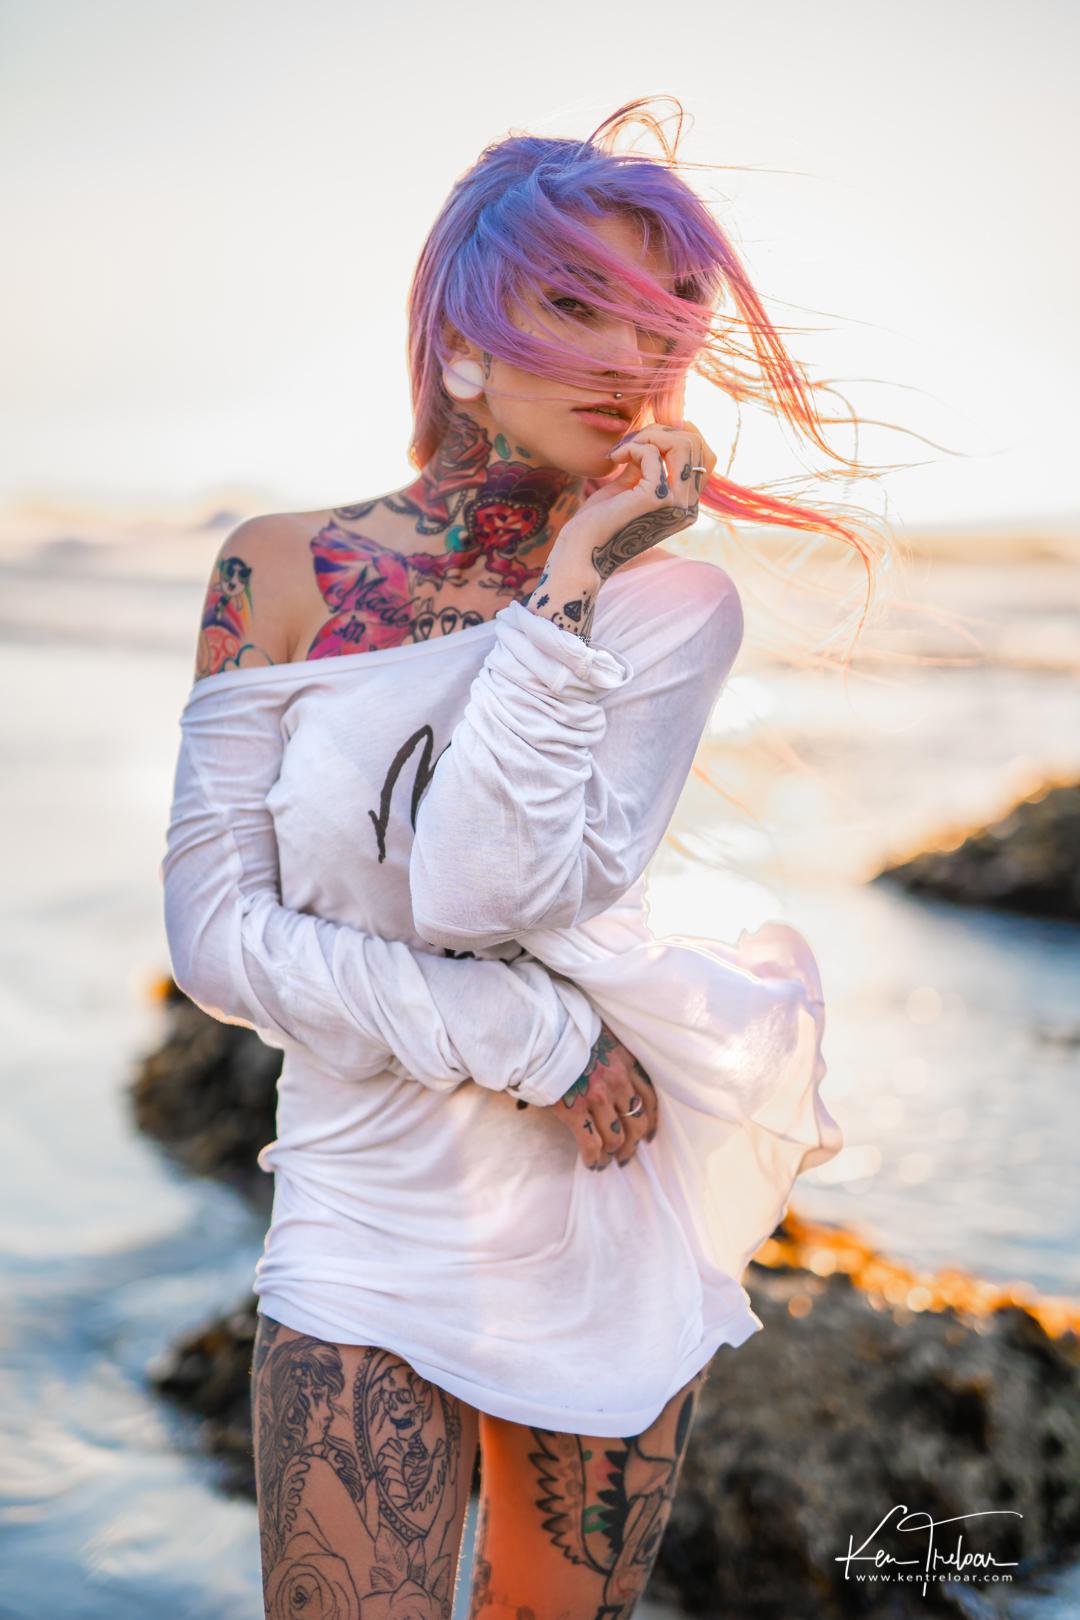 2_Christine Van Ink - Kief Modils - Cape Town LLandudno - Portrait session - by Ken Treloar Photography-Sml-5.jpg